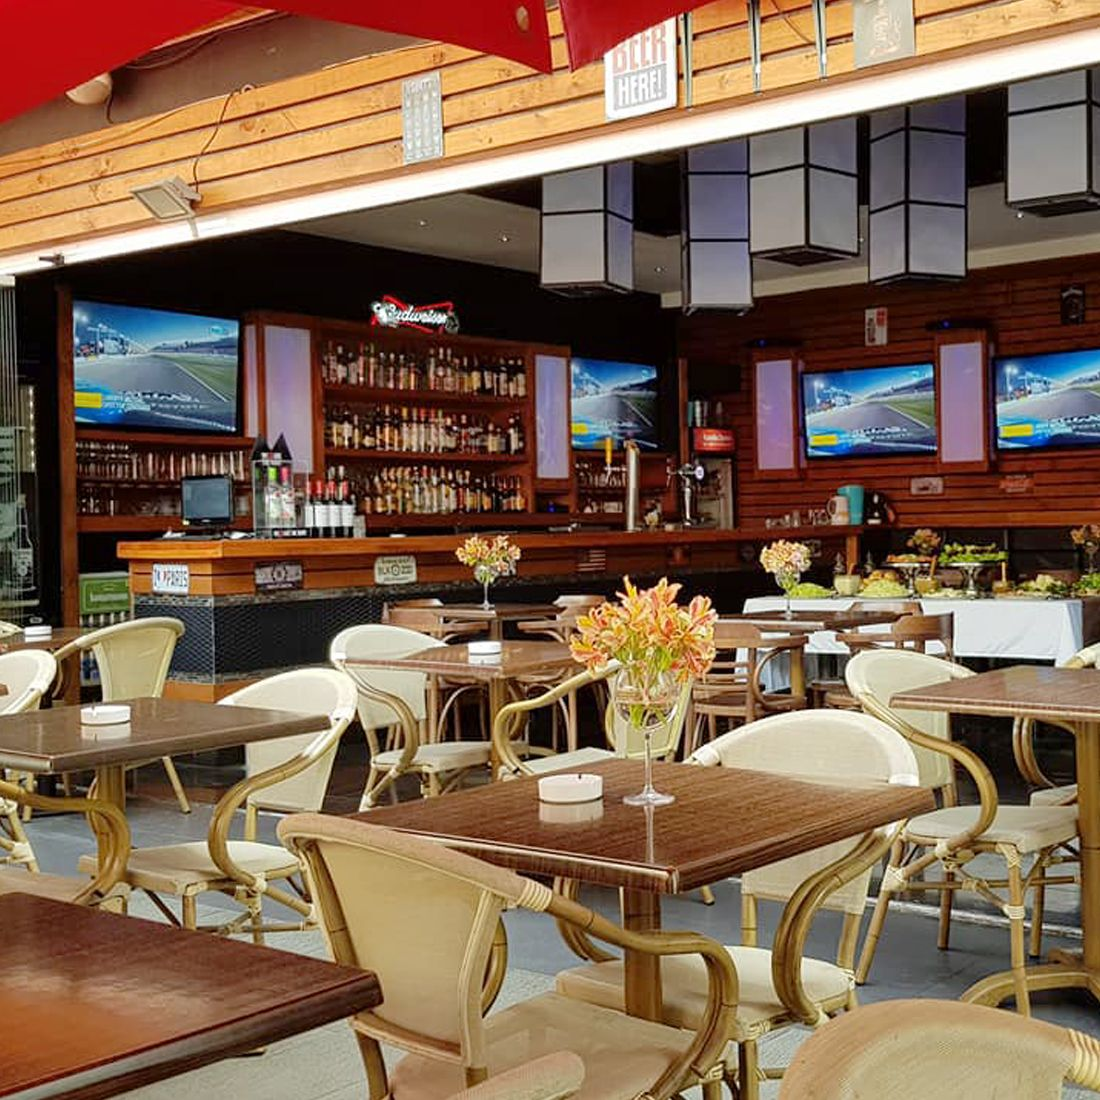 SANBAR Restaurante - Reserva en restaurantes de Comida AMERICANA - ÑUñOA - MESA 24/7 | SANTIAGO - Perú